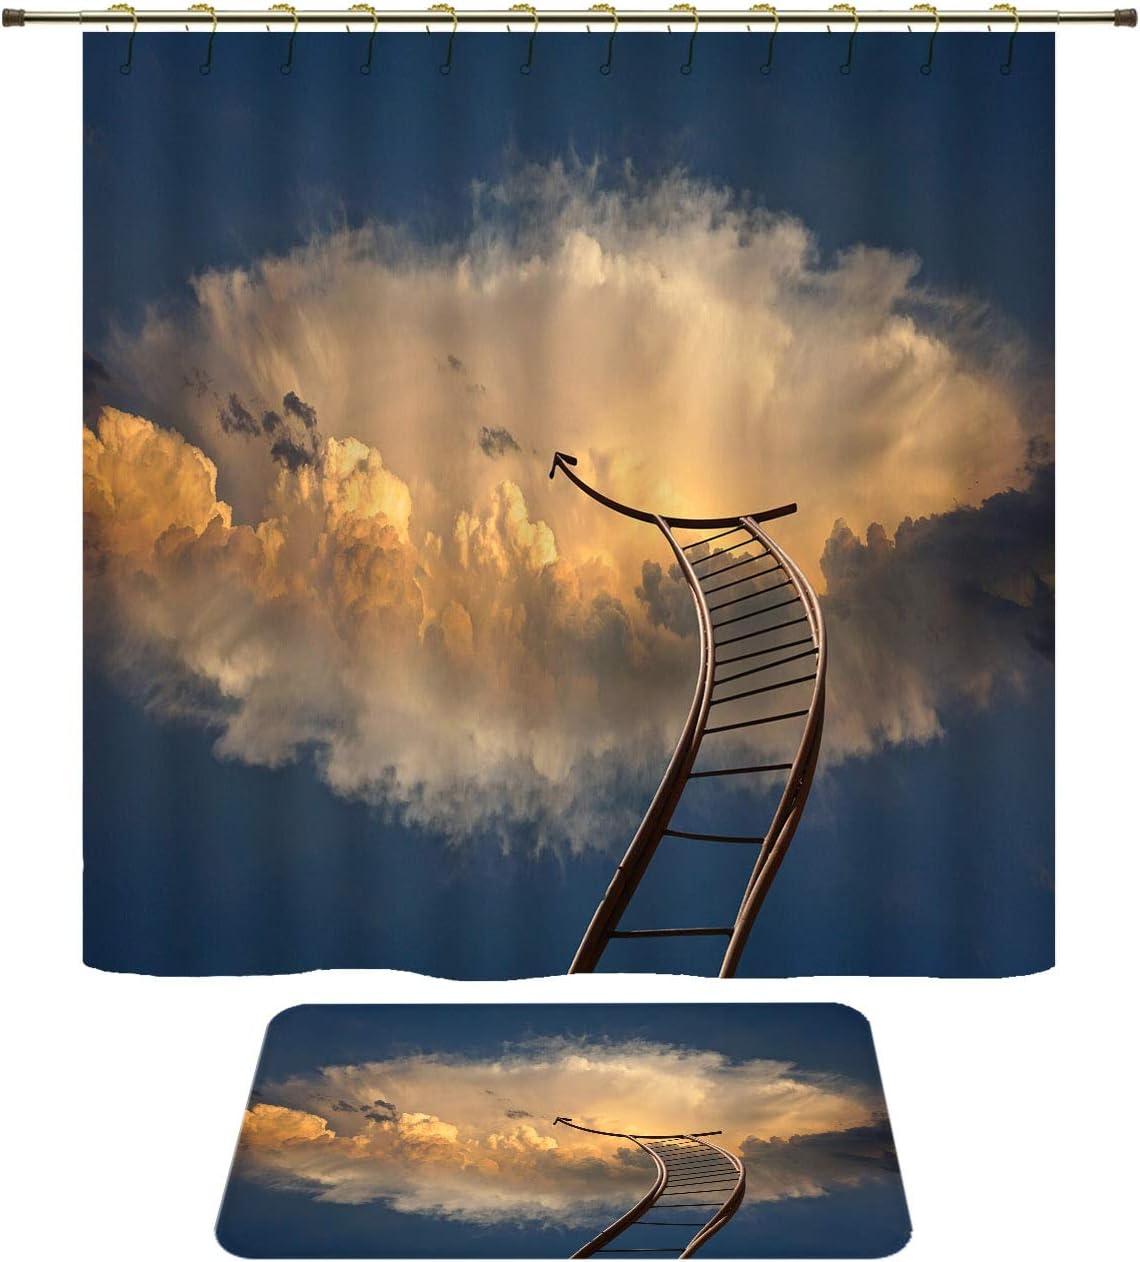 54x72 inch//16x24 inch Color Waterproof Shower Curtain Bath Rug Set Beyond Cloud Sky Ladder Ladder of Success Rise Climb Bath Curtain Doormat Set for Bathroom Contain 12 Gold Shower Curtain Hooks